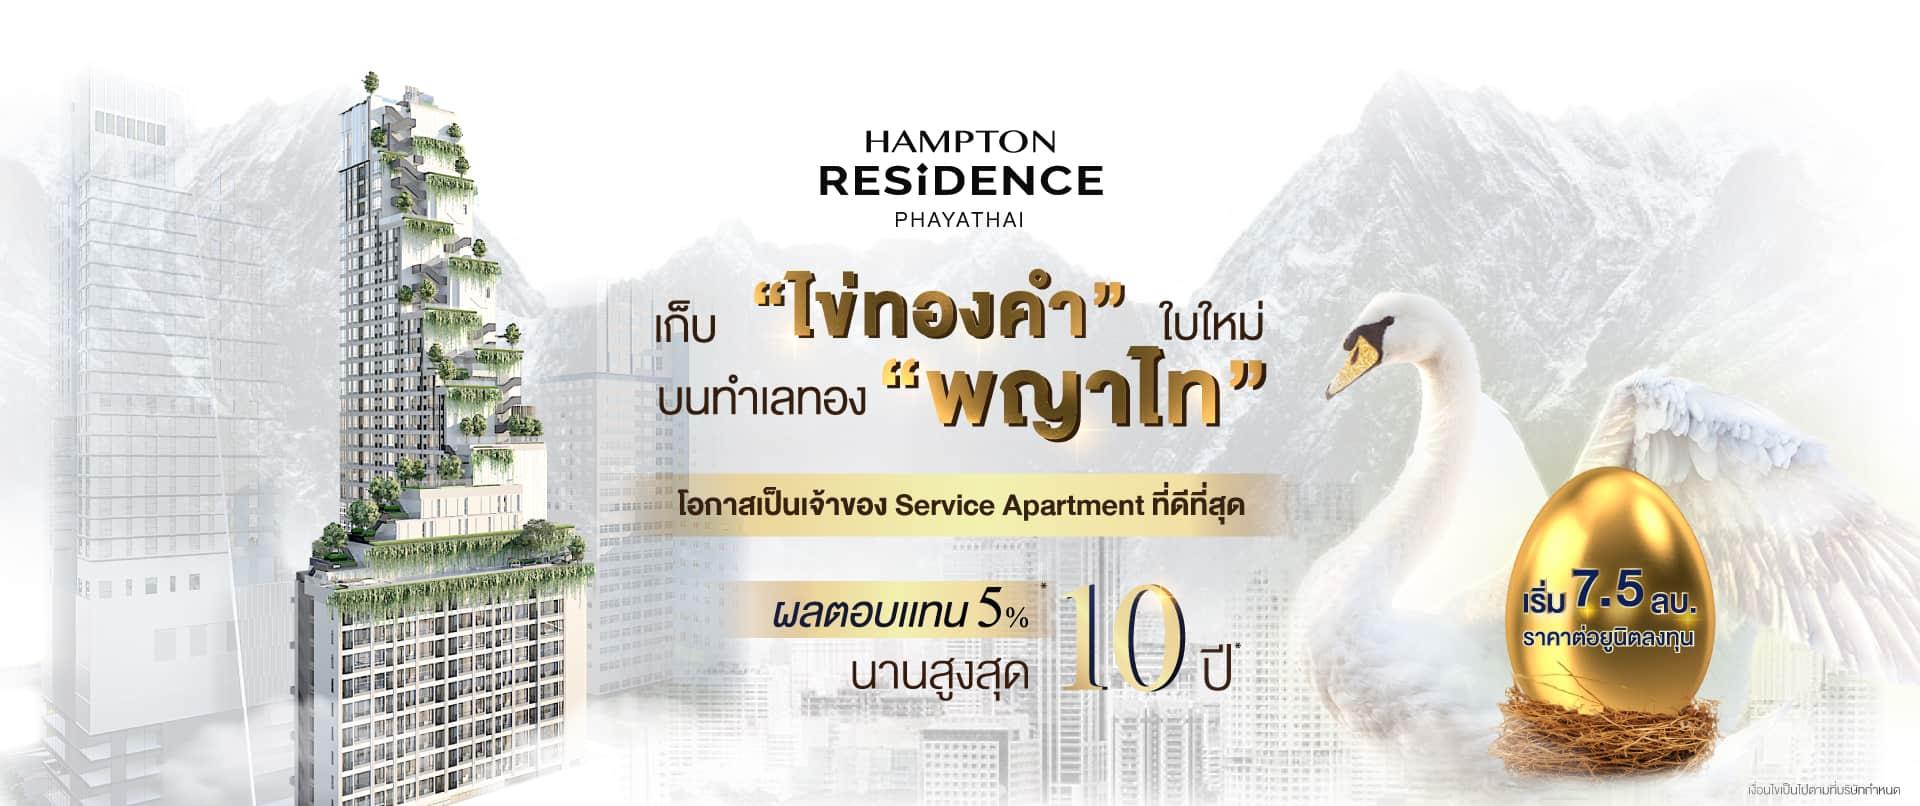 Hampton Residence Phayathai